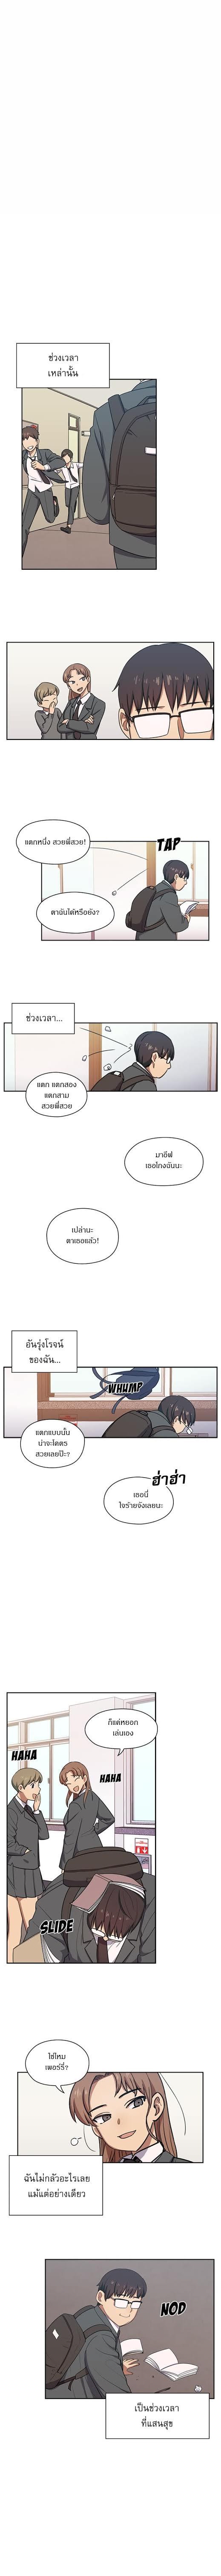 Crime and Punishment - หน้า 9